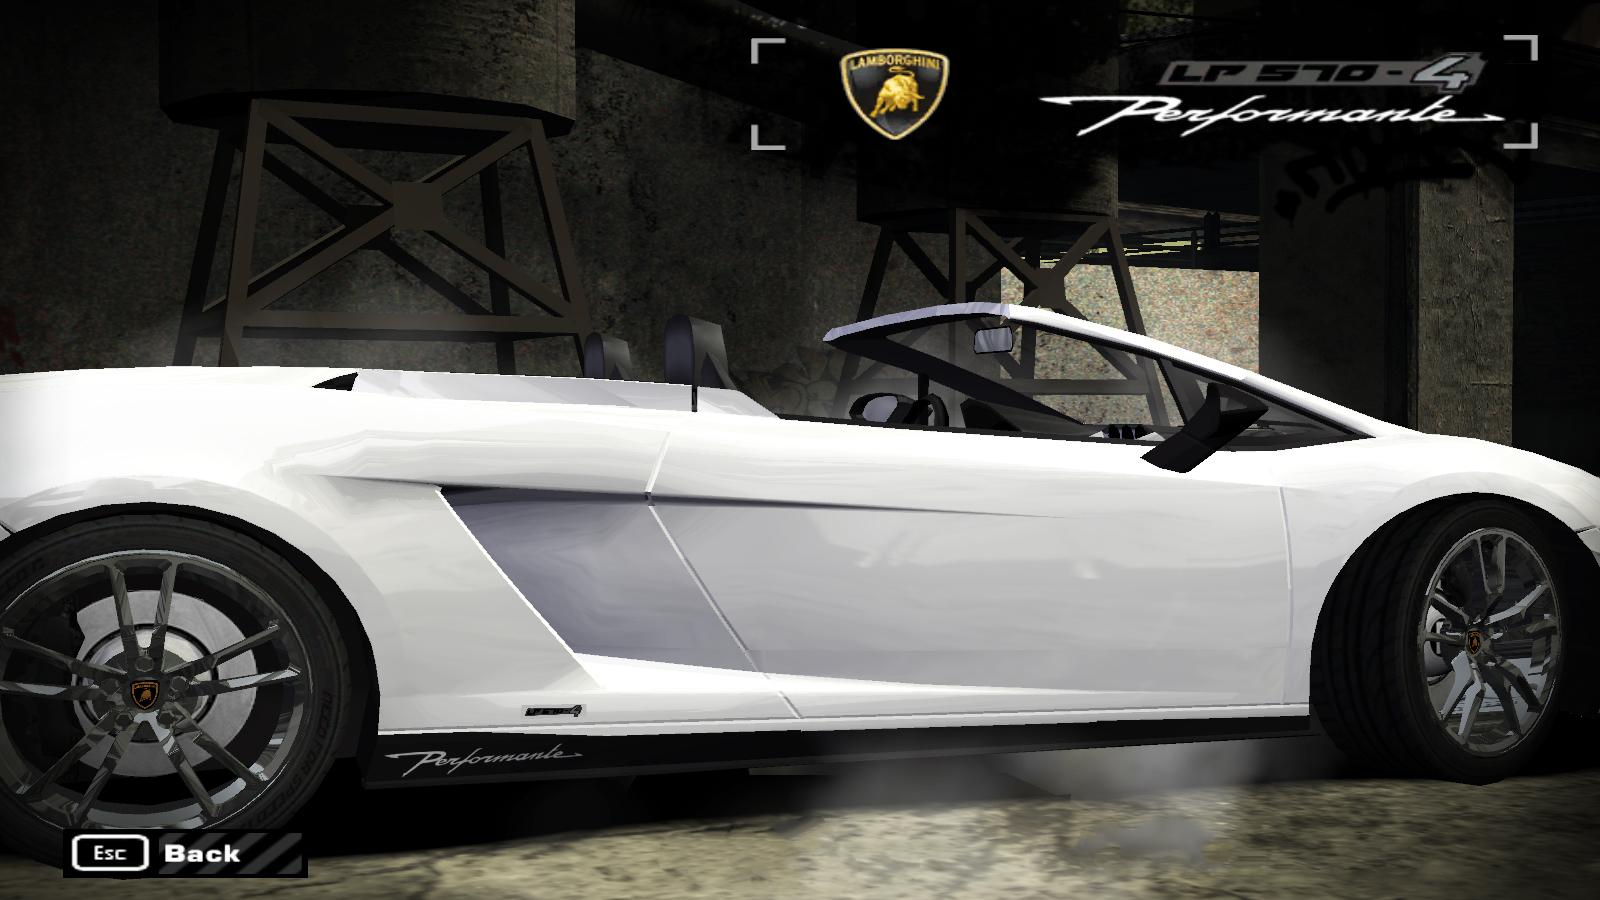 Need For Speed Most Wanted Lamborghini Gallardo LP570-4